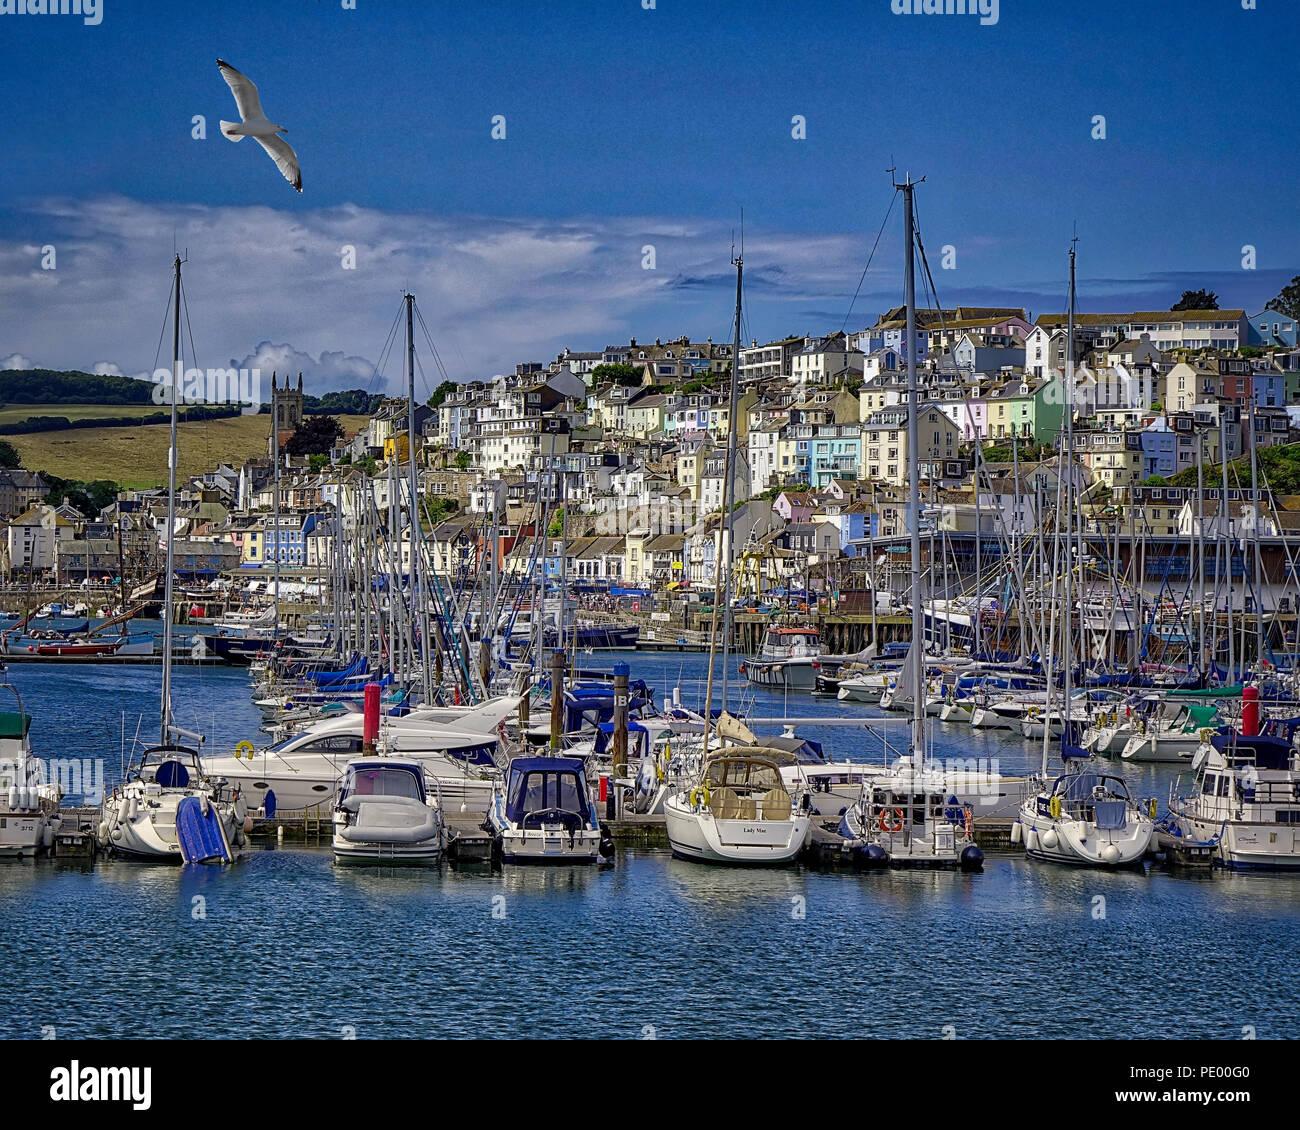 GB - DEVONSHIRE: Picturesque Brixham harbour and village - Stock Image